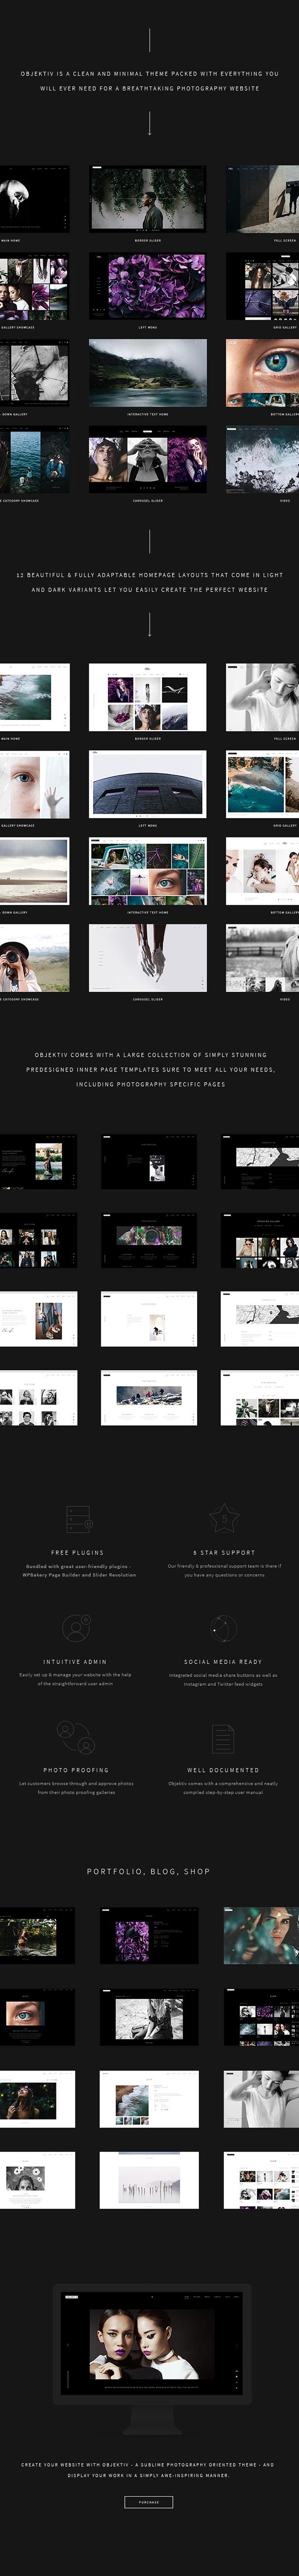 Objektiv - Photography Theme - 1